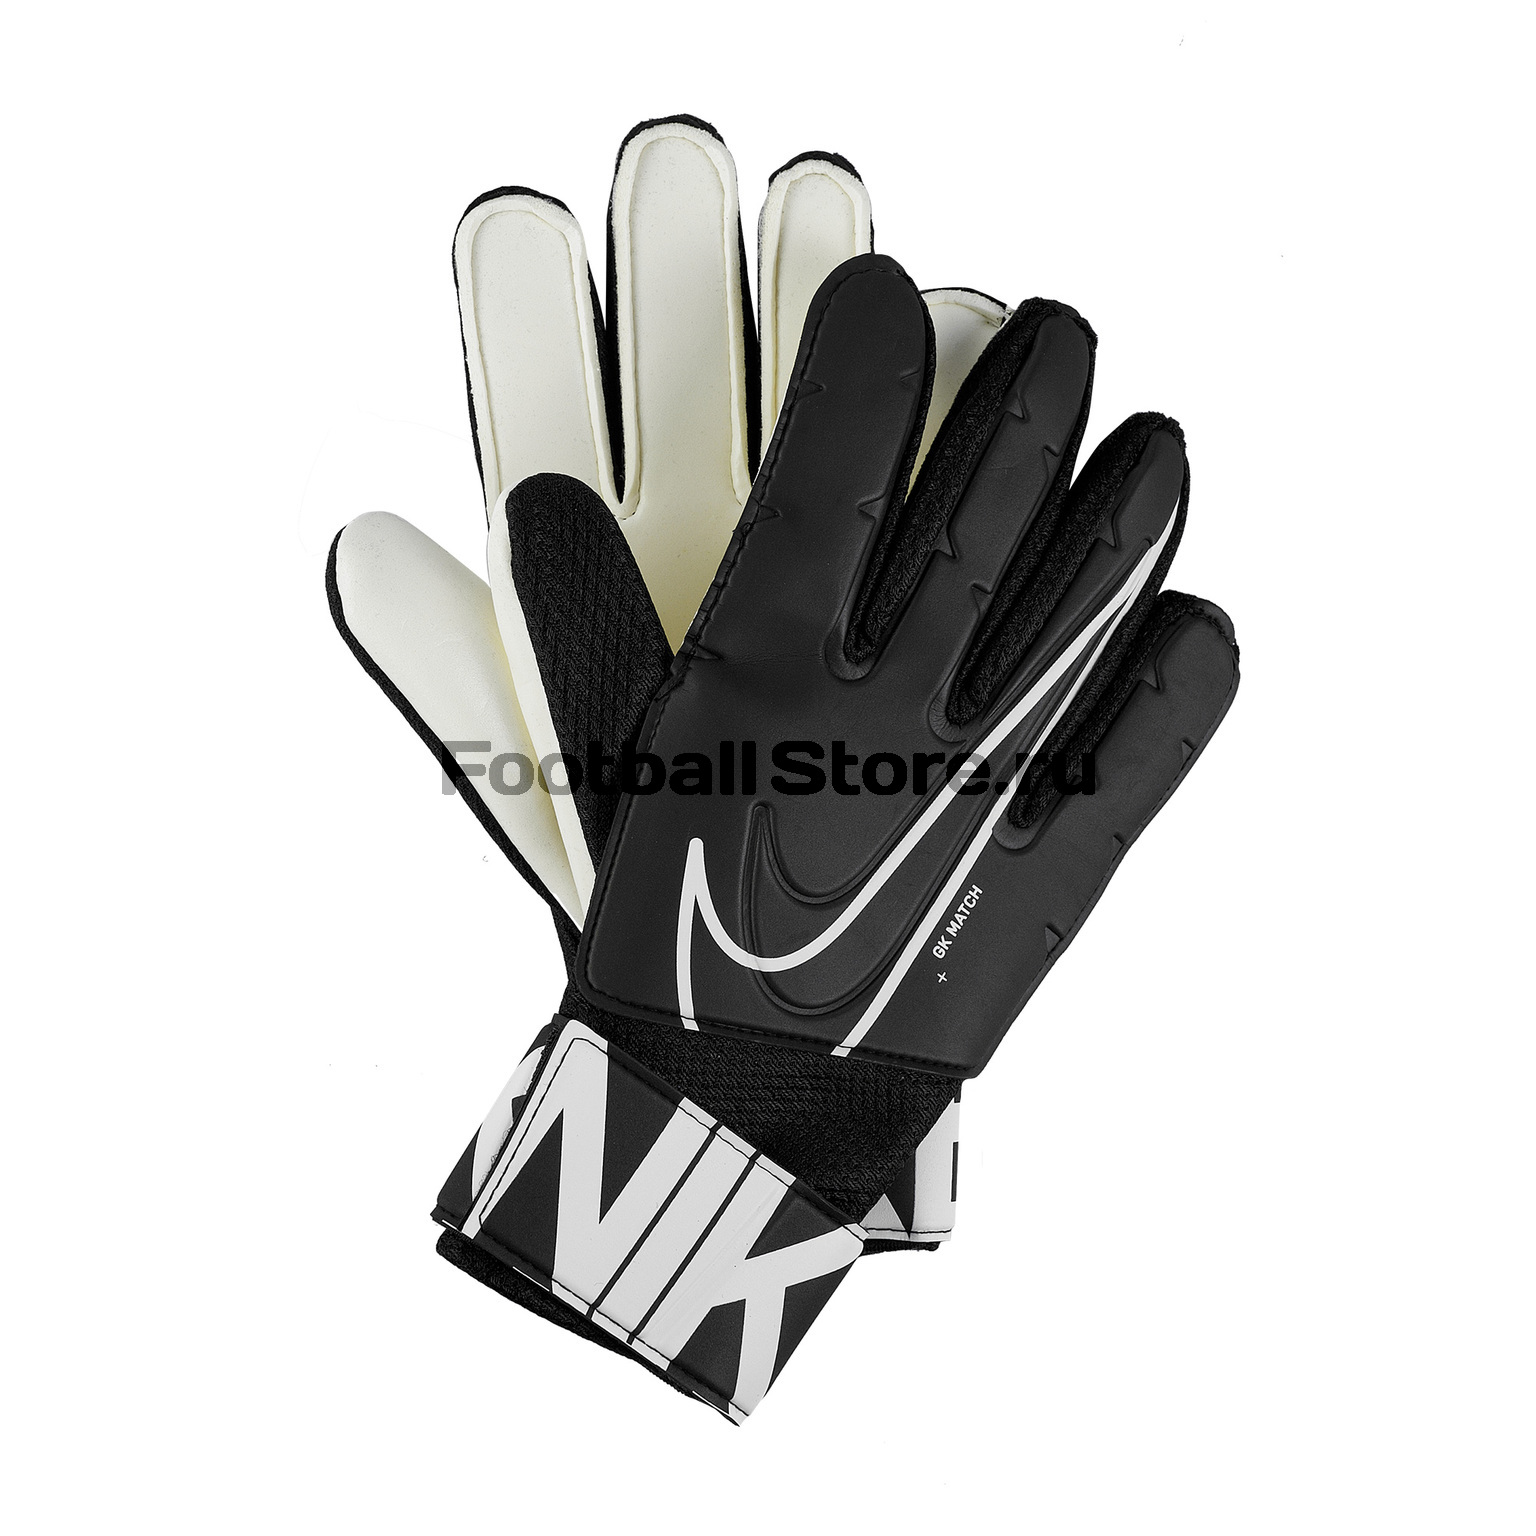 цена Перчатки вратарские Nike Match GS3882-010 в интернет-магазинах